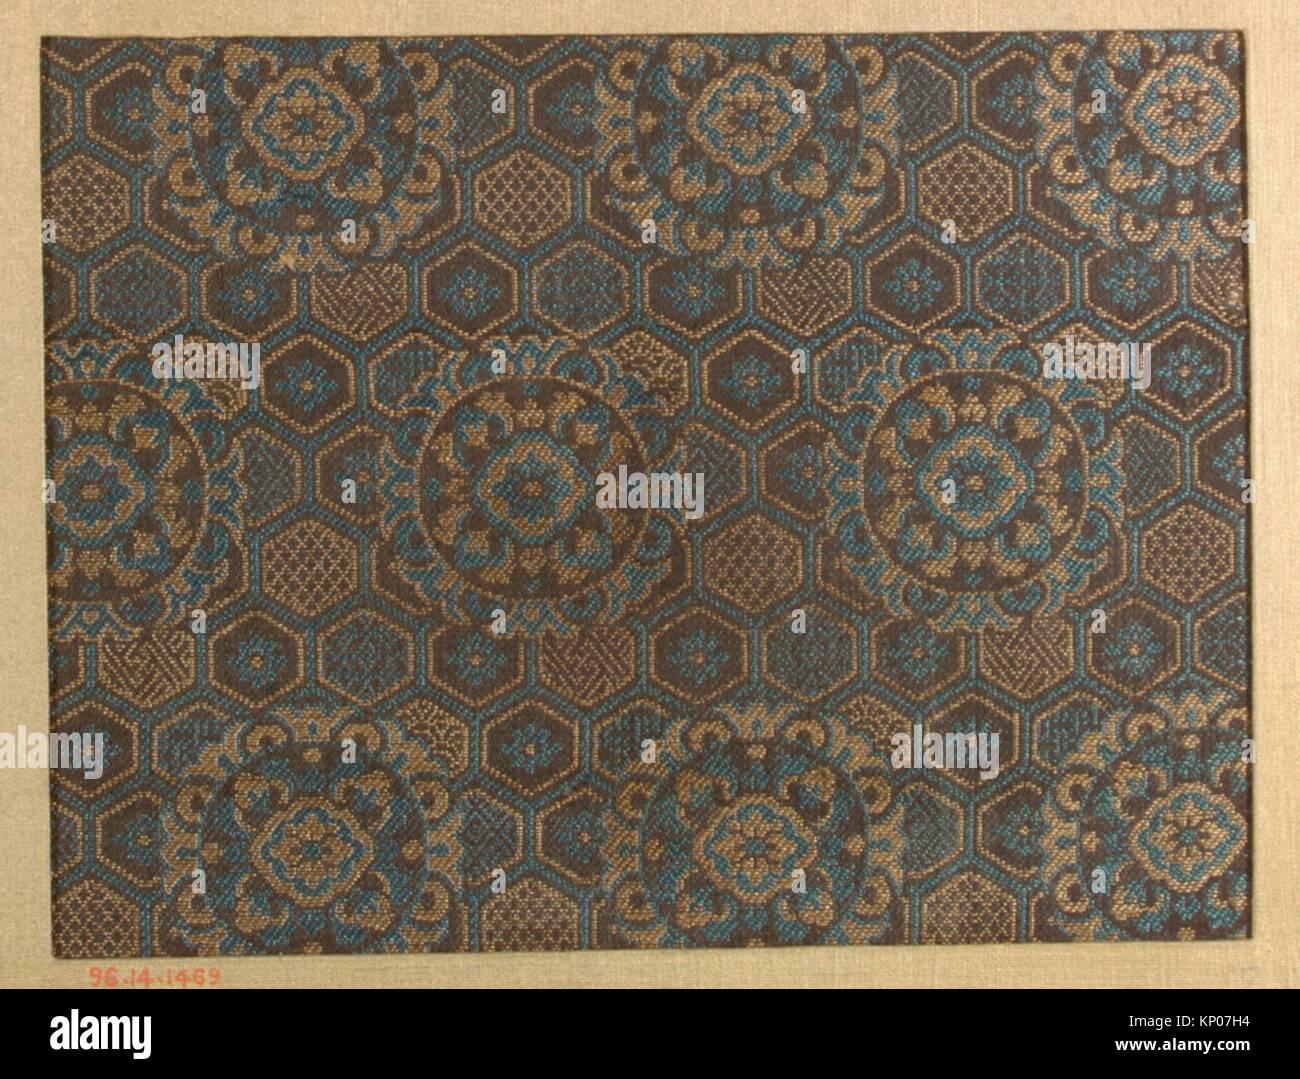 Stück. Datum: 18.-19. Jahrhundert; Kultur: Japan; Medium: Seide; Abmessungen: 5 3/4 x 7 1/2 in. (14.61 x 19.05 Stockbild